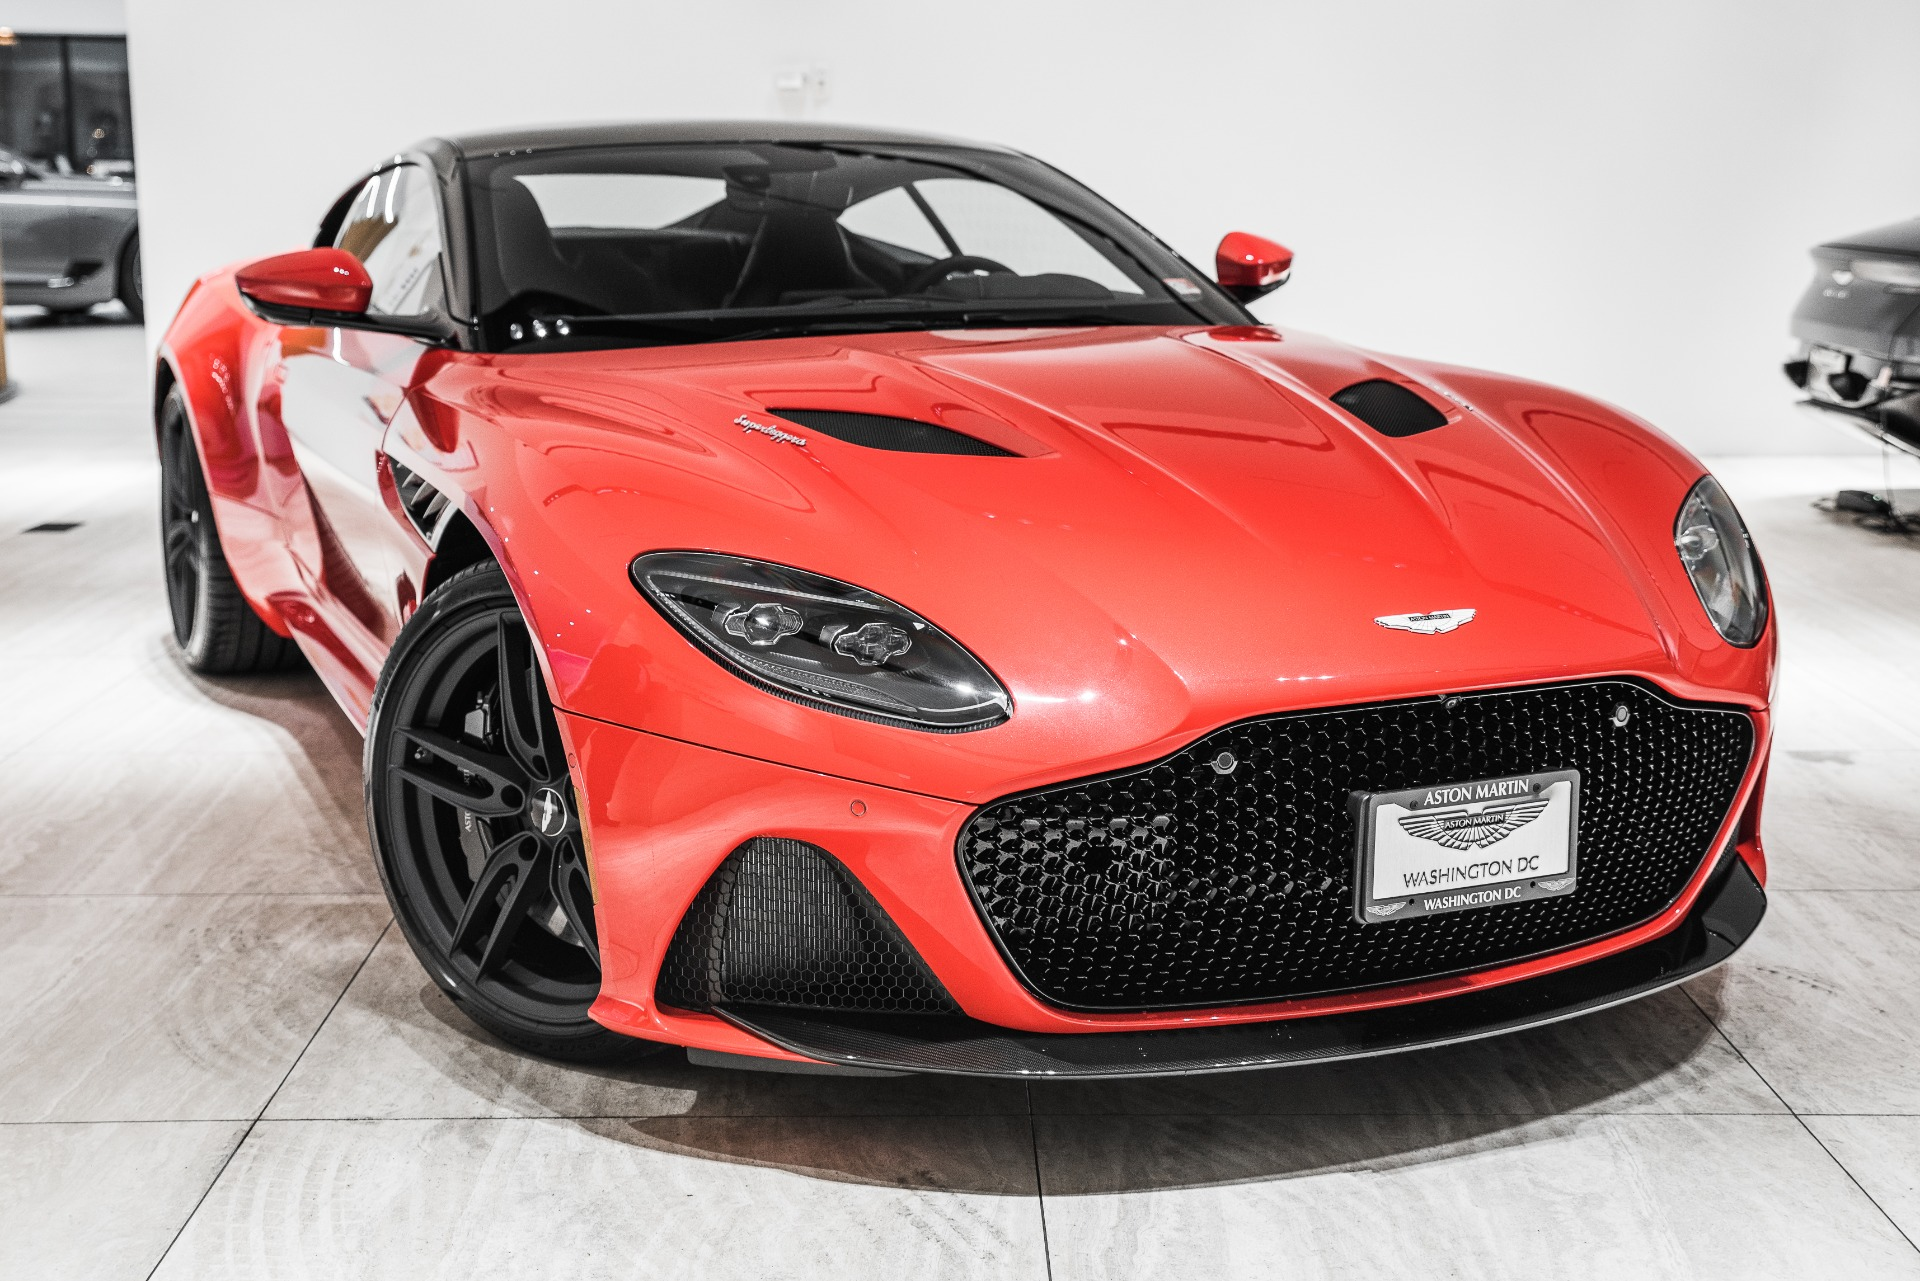 2020 Aston Martin Dbs Superleggera Stock 20nr01668 For Sale Near Vienna Va Va Aston Martin Dealer For Sale In Vienna Va 20nr01668 Exclusive Automotive Group